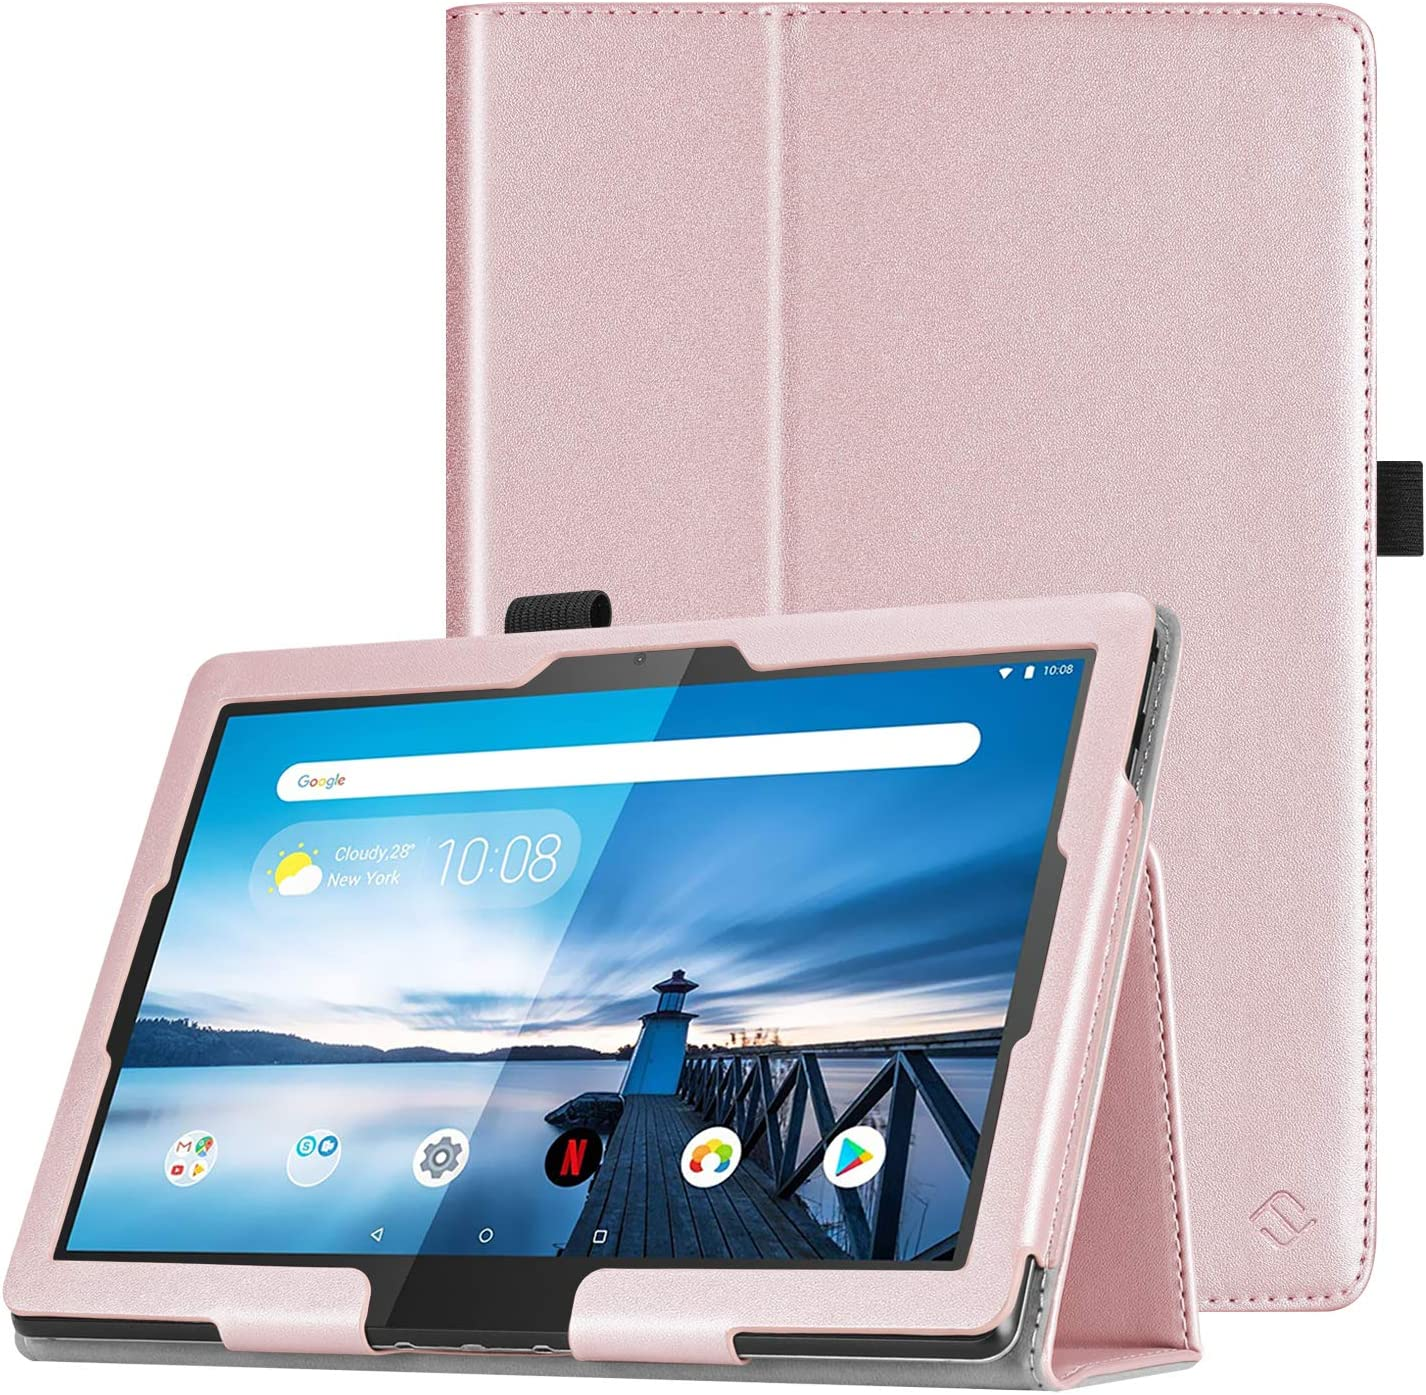 "Fintie Case for Lenovo Smart Tab M10 HD / P10 / M10 - Premium PU Leather Folio Cover for Lenovo Tab M10 HD TB-X505F TB-X505L / P10 TB-X705F TB-X705L / M10 TB-X605F 10.1"" Tablet, Rose Gold"